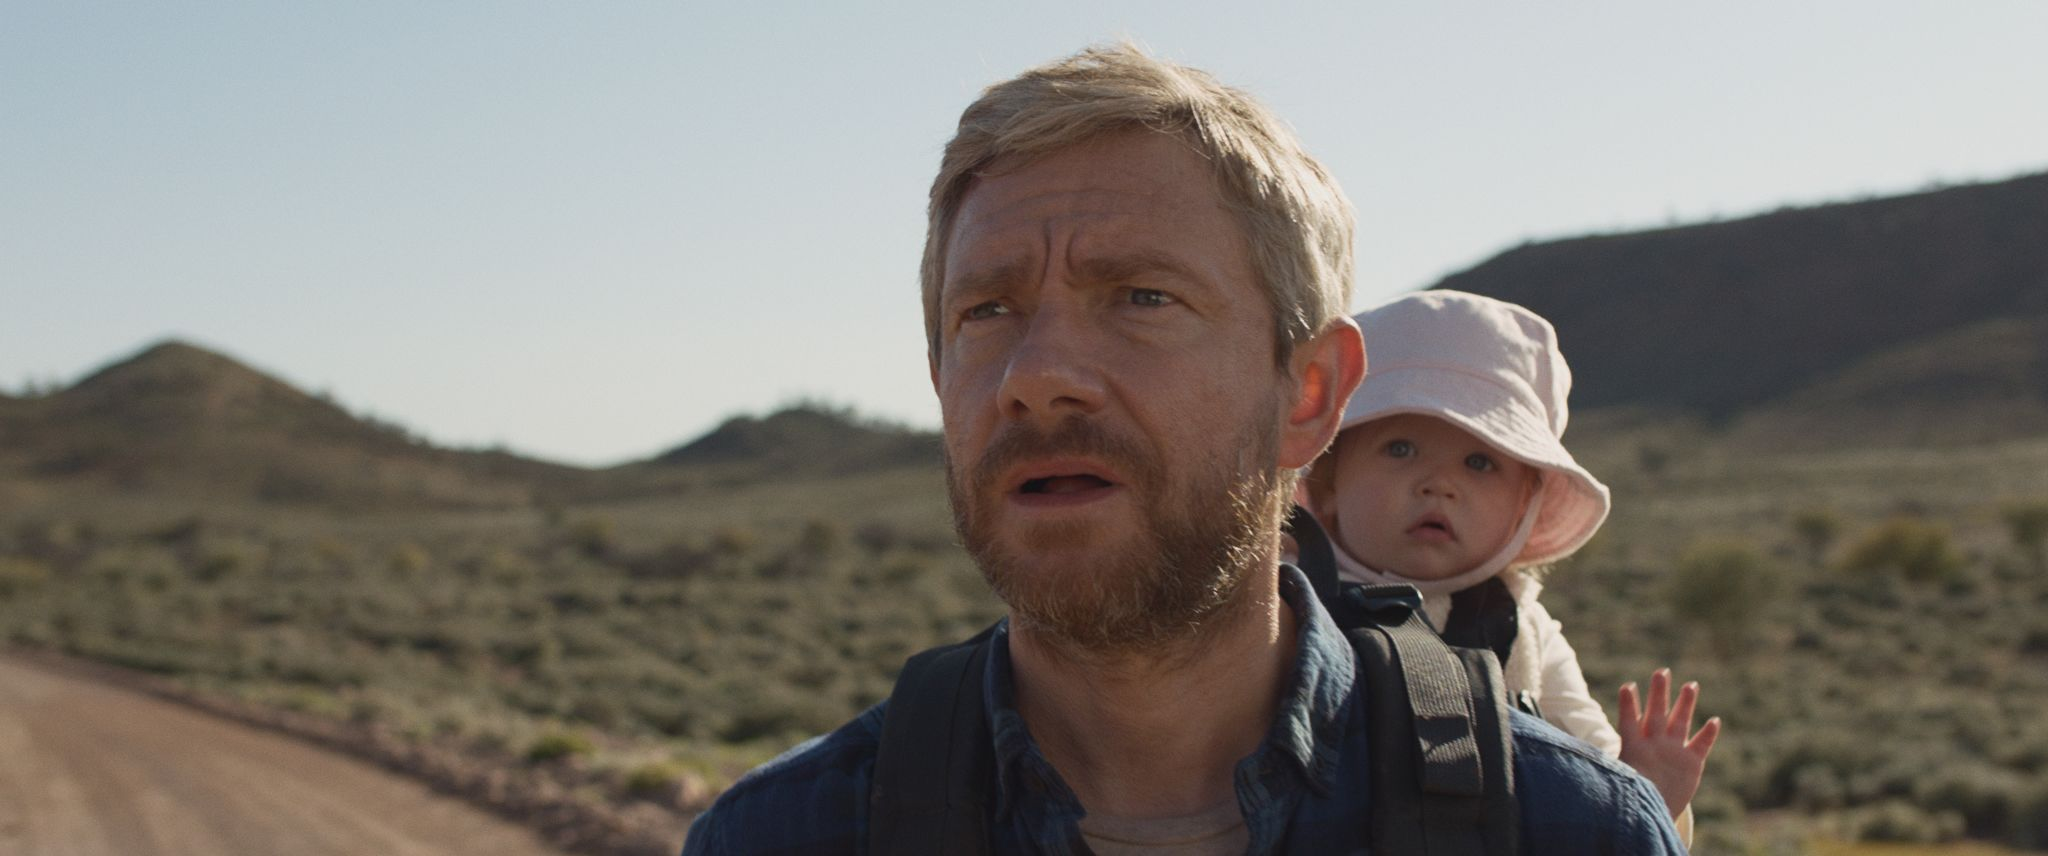 Martin-Freeman-Cargo-movie